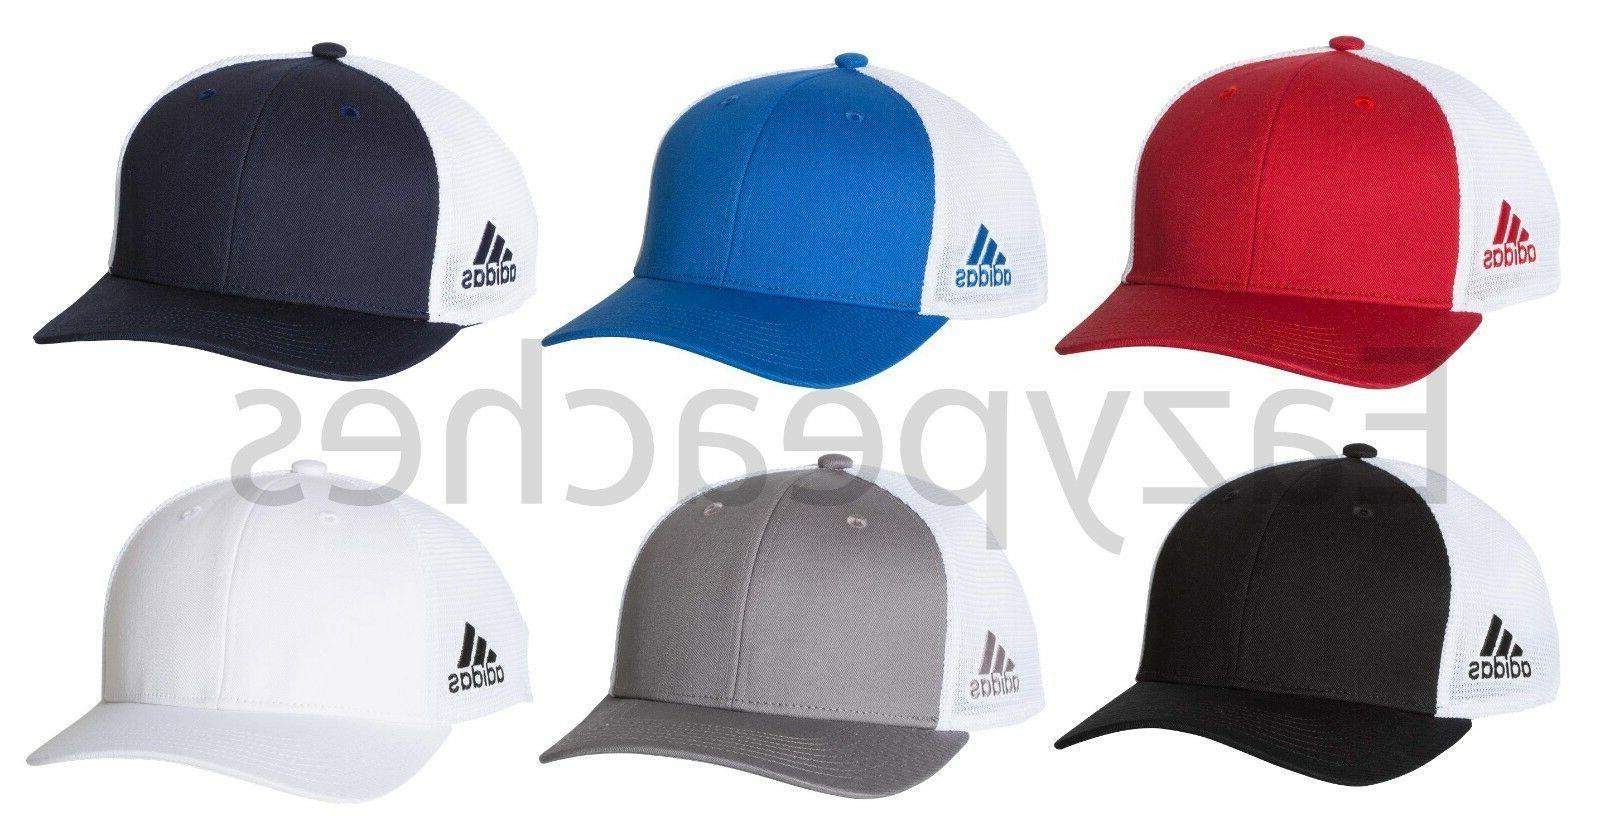 ADIDAS GOLF Men's Adjustable Baseball Cap Hat